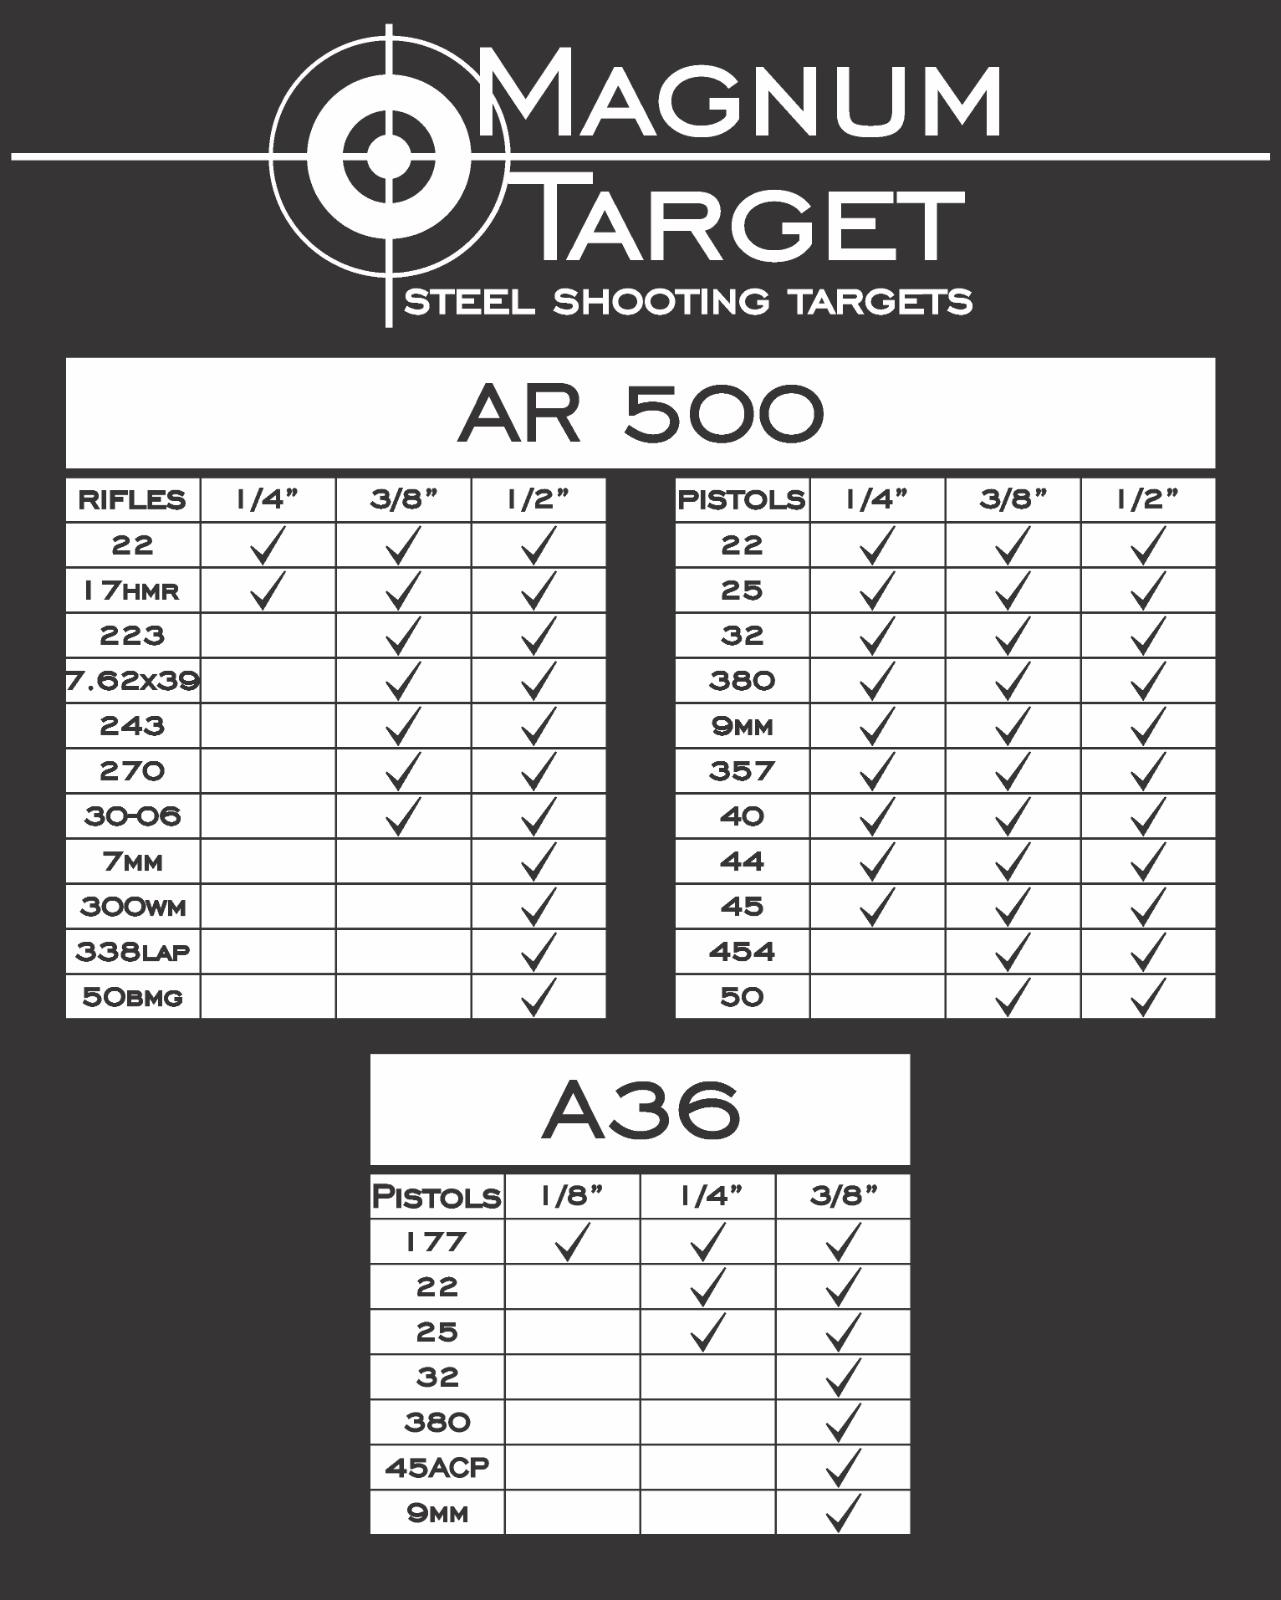 IDPA ISPC 12x20, 10in, 8in, 6in, 4in 3 8in 8in 8in AR500 de acero de disparo. gongs objetivos e19f09